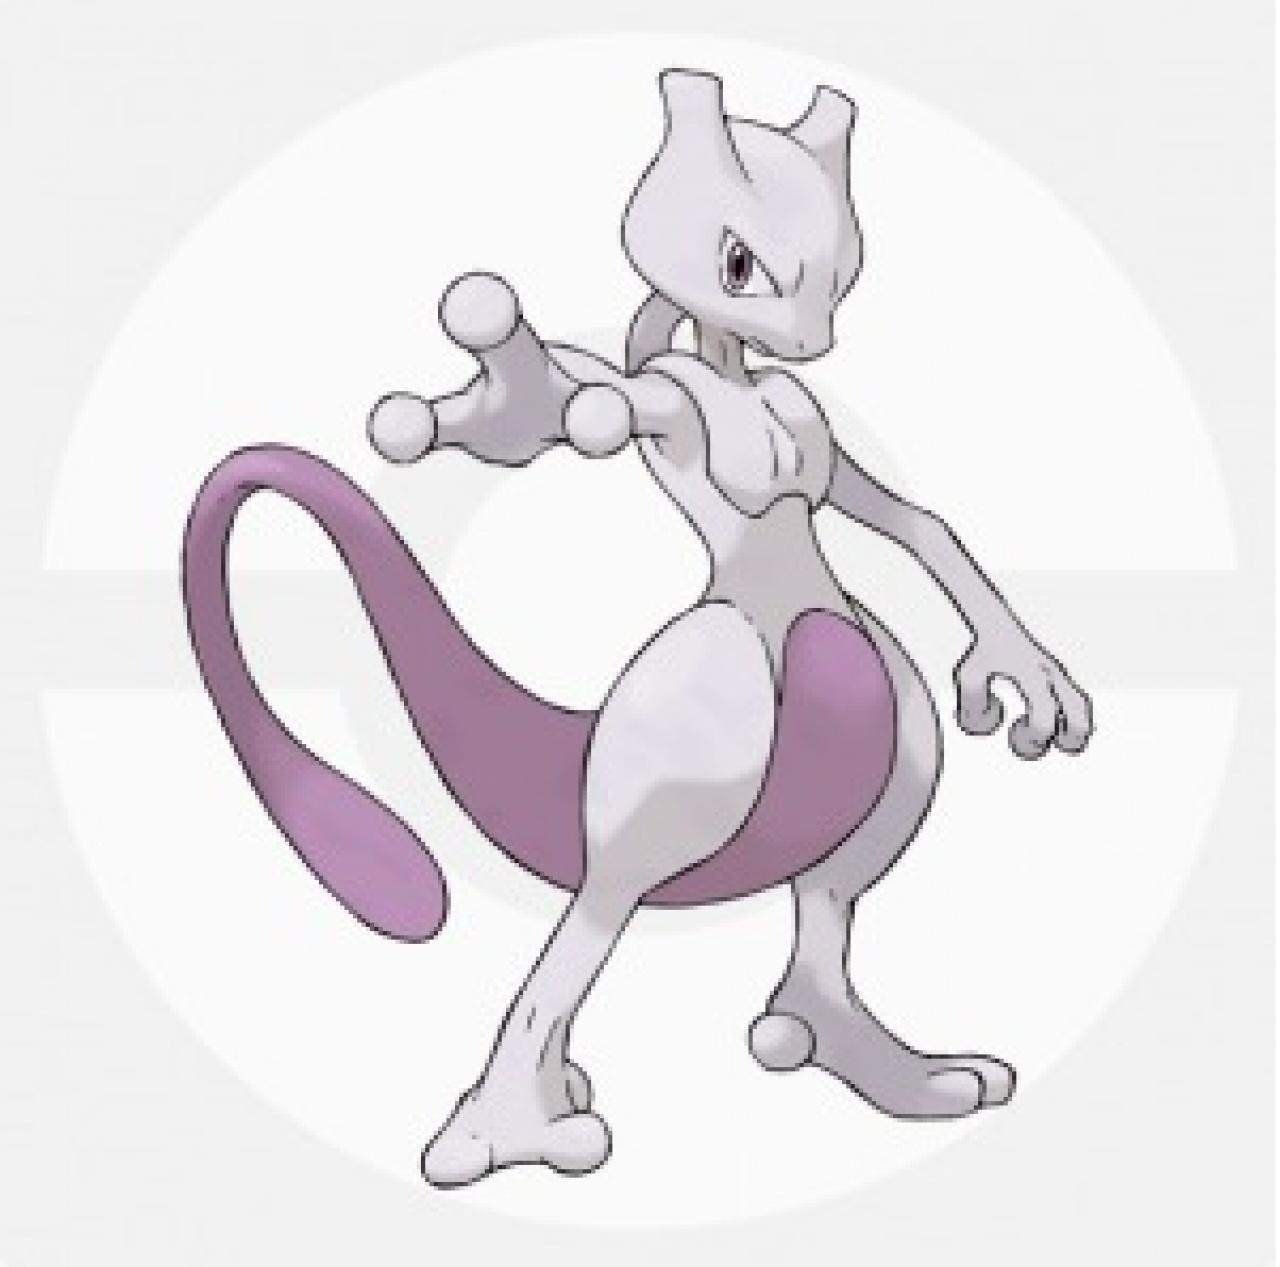 Pokemon GO攻略:珍貴寵物圖文列表 中英文譯名一覽|香港01|科技玩物|